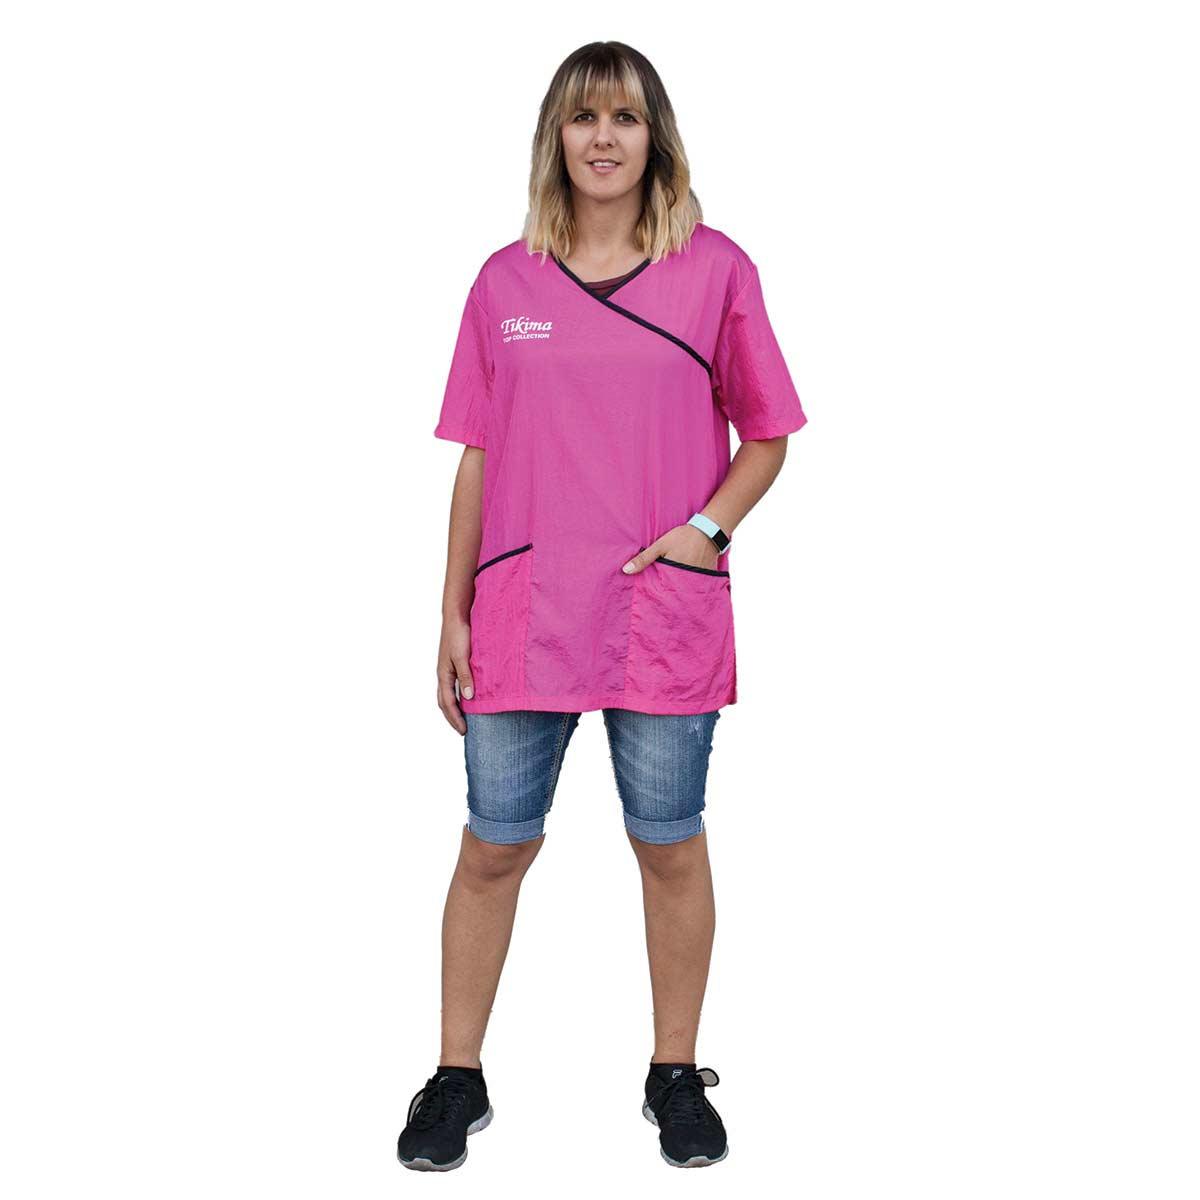 Tikima Fiori Grooming Shirt 3X Large - Pink